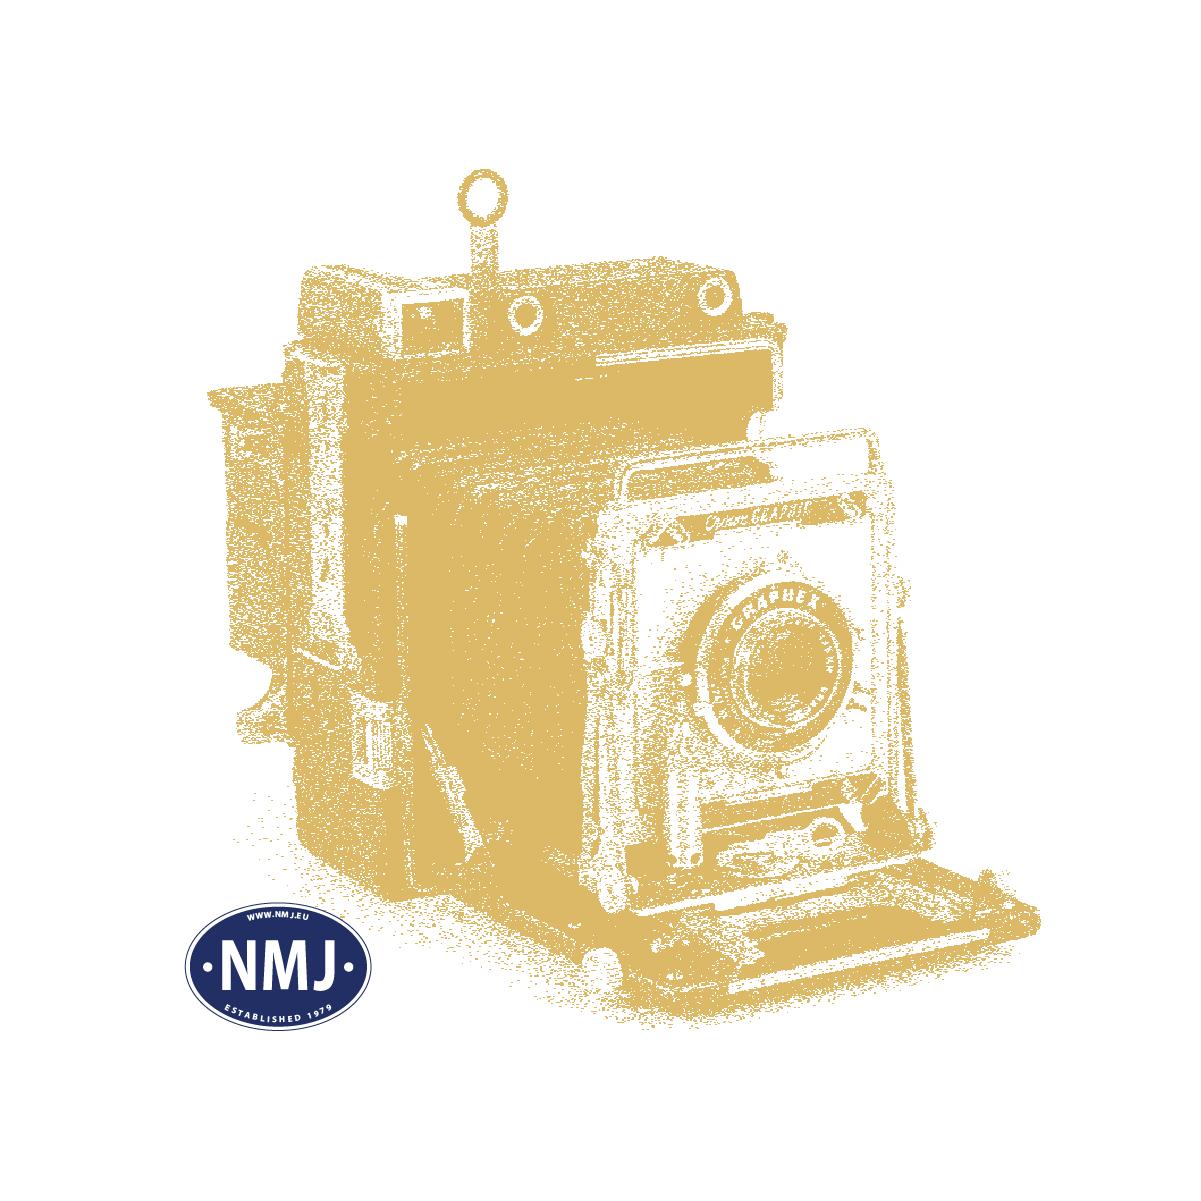 NMJST316494 - NMJ Superline NSB T3 16494 Stakevogn m/ Bremseplattform, *NMJ 40 ÅR*